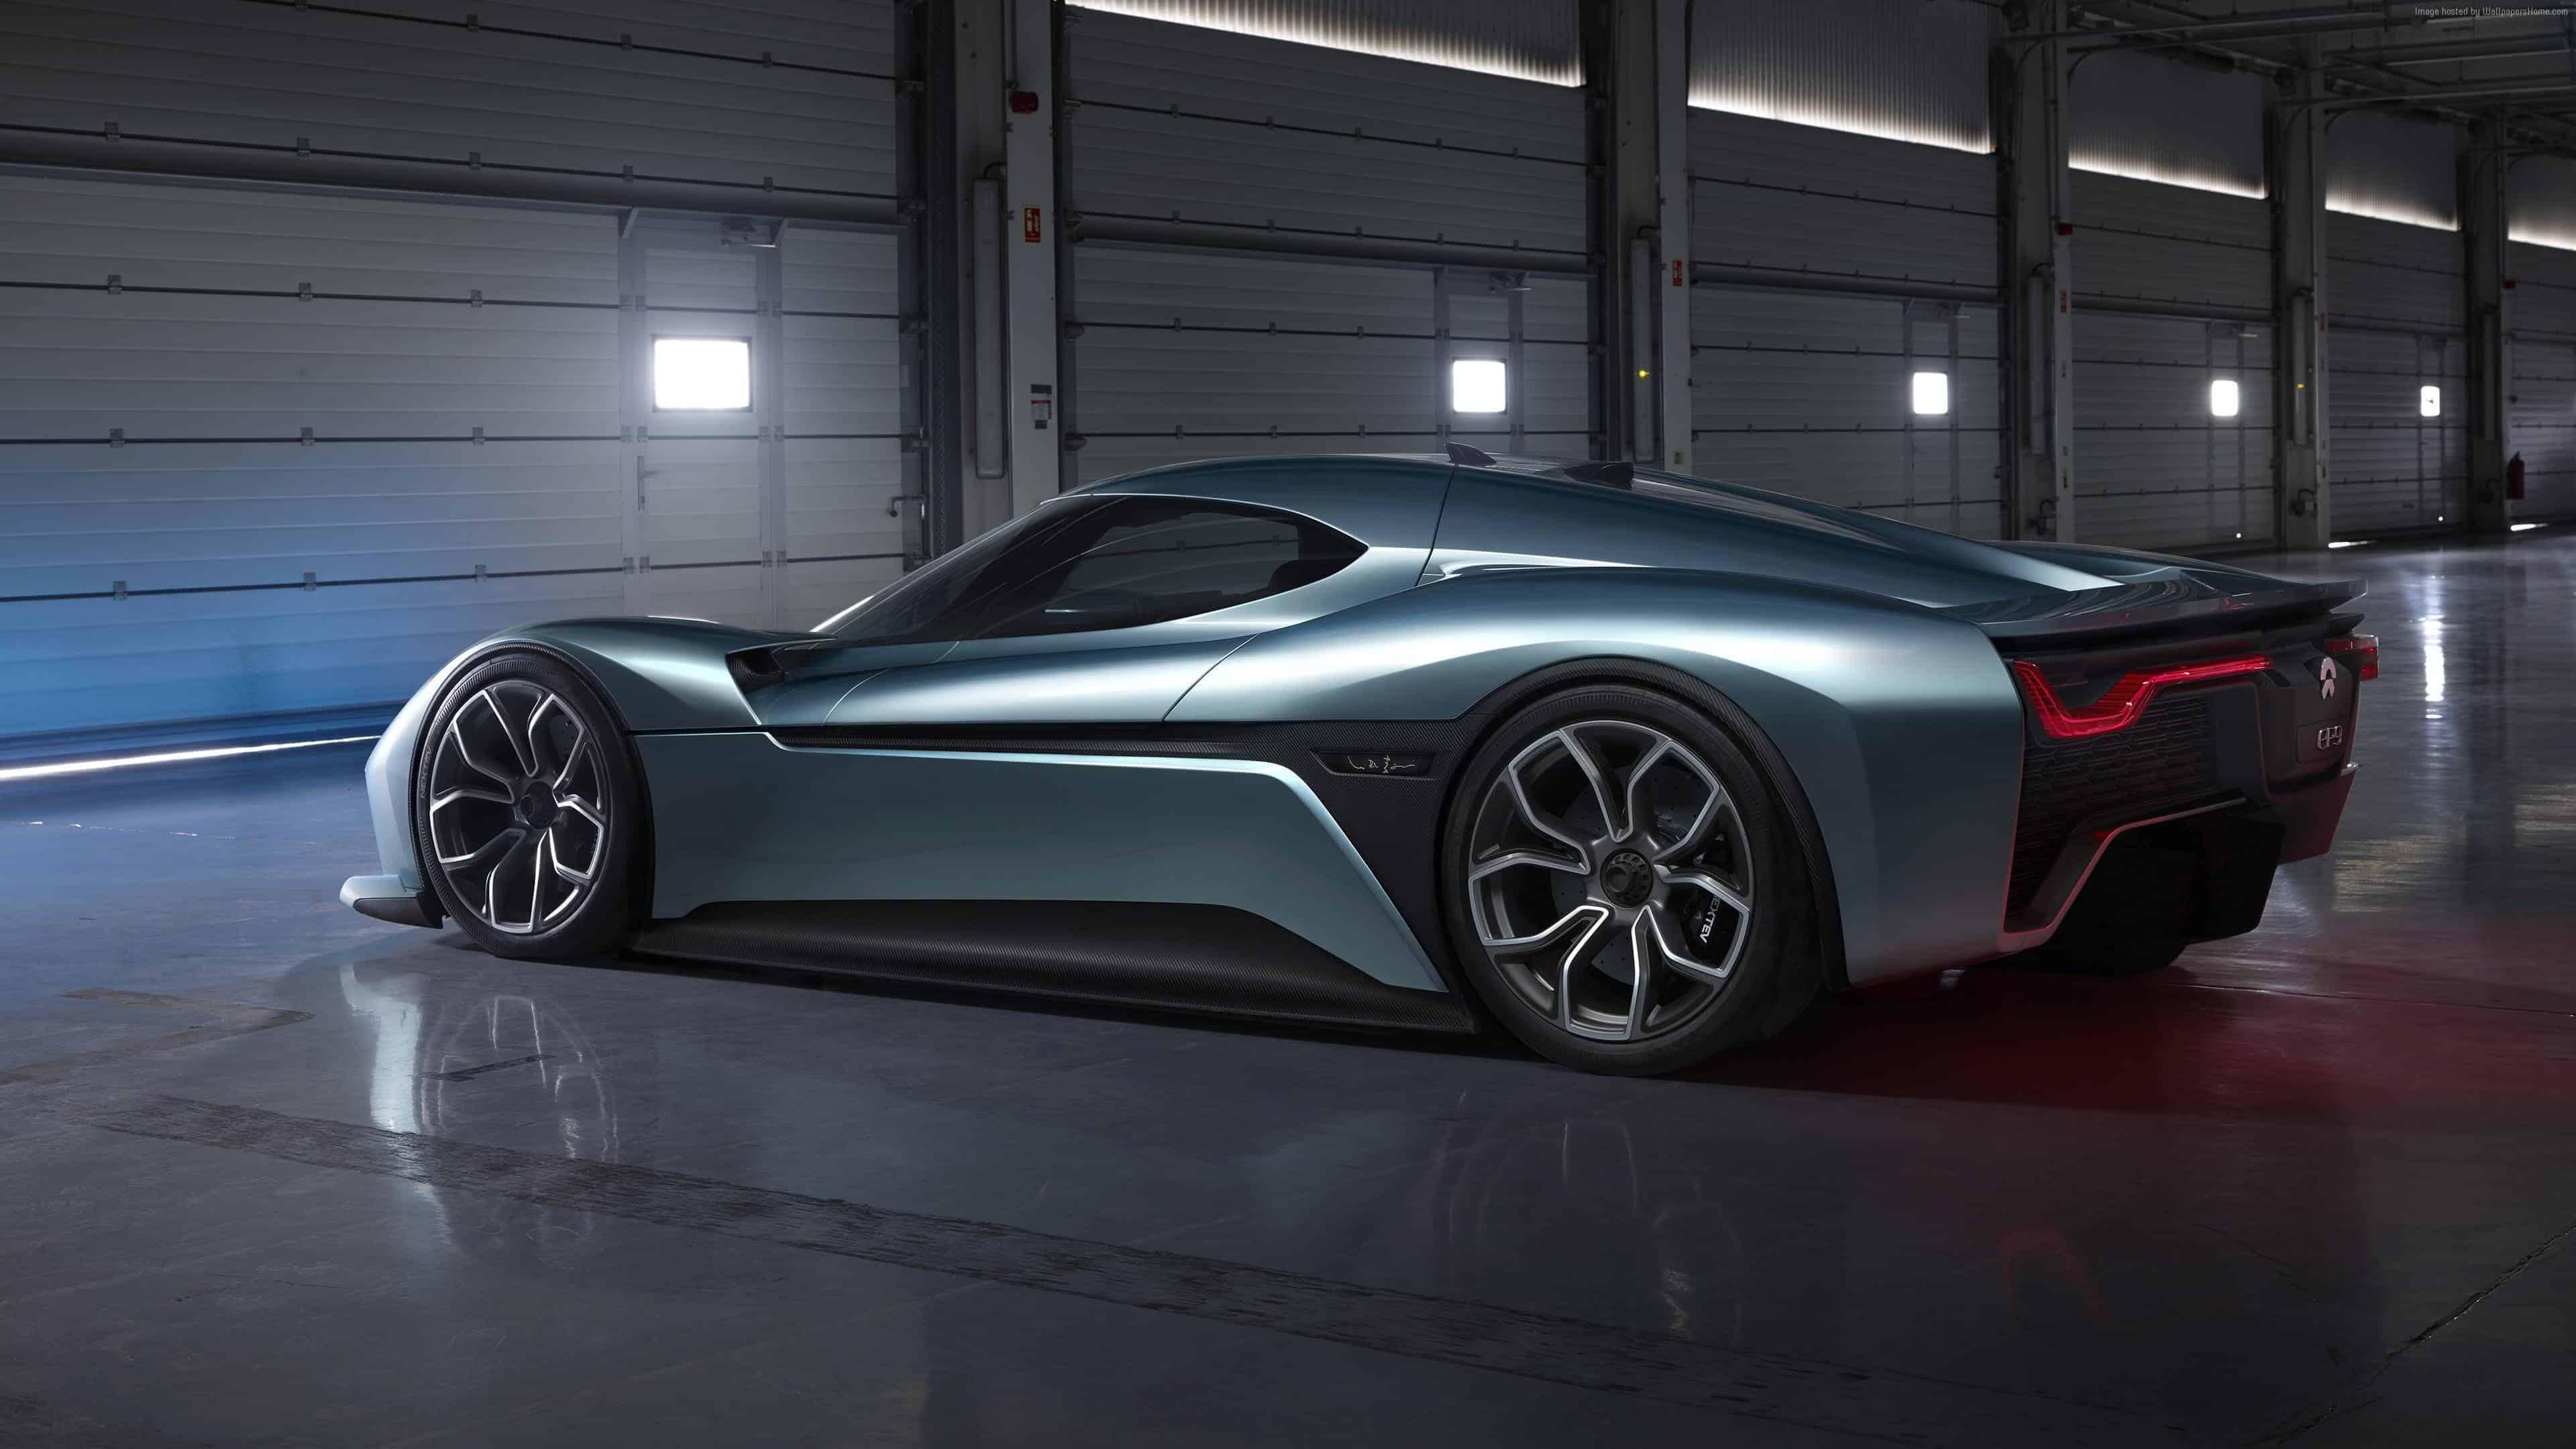 nio ep9 nextev electric supercar uhd 4k wallpaper